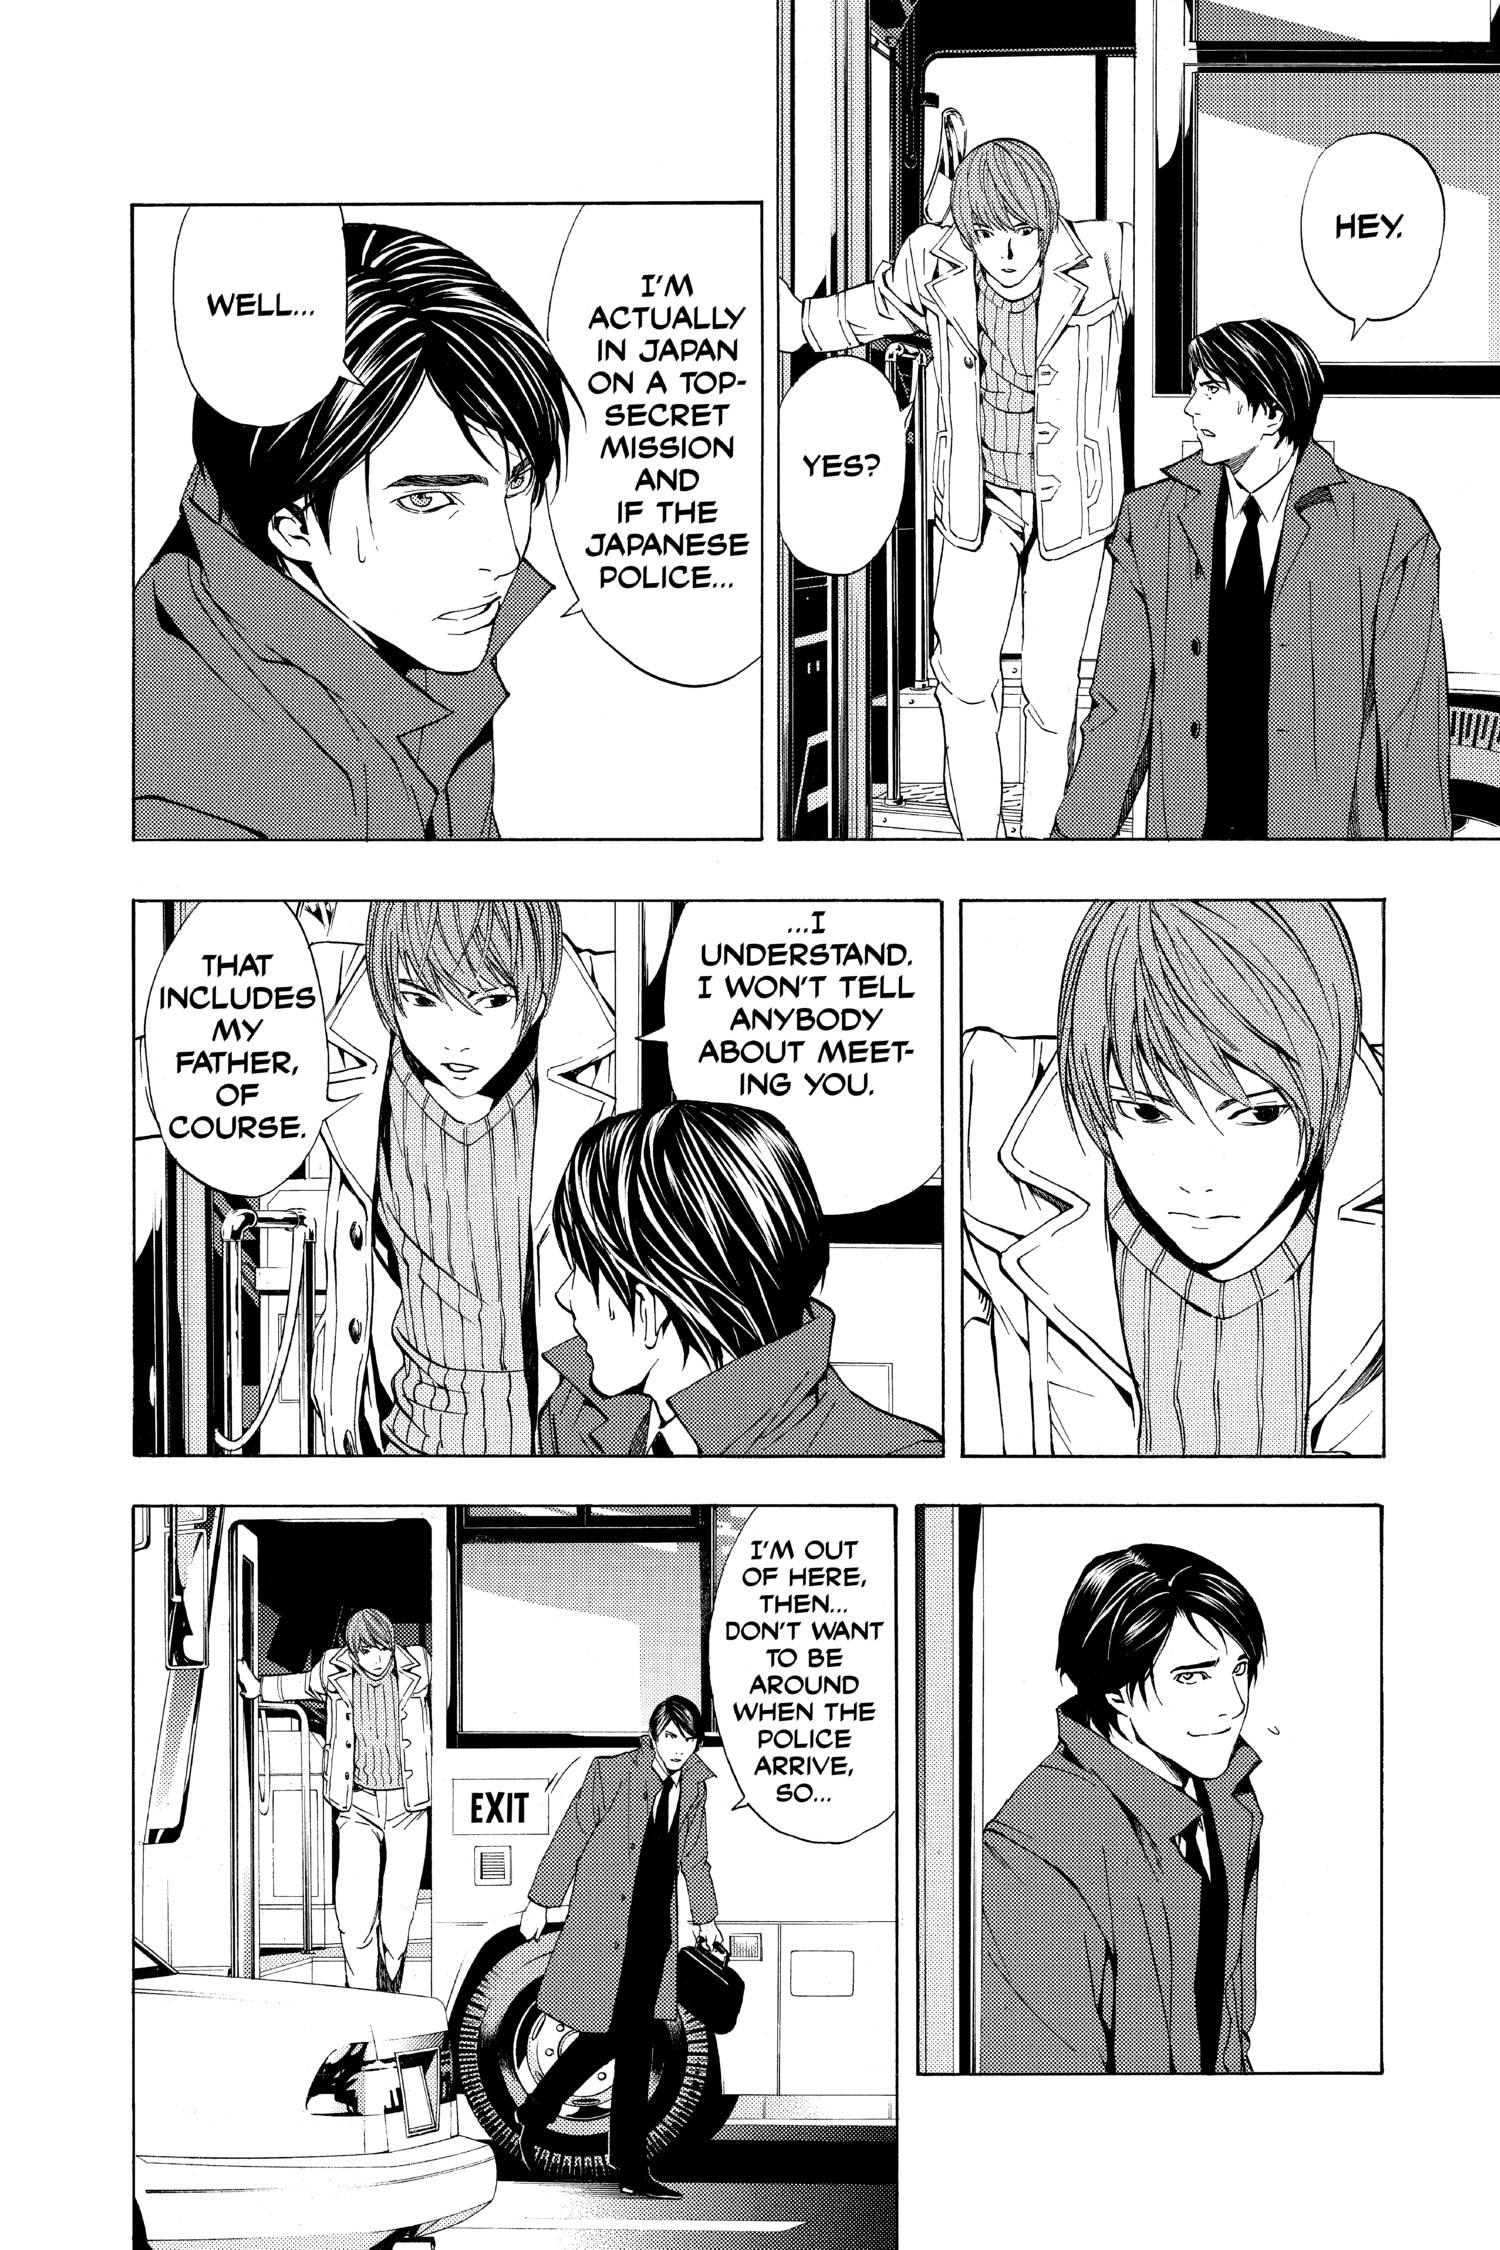 Death note manga volume 2 - Manga death note ...